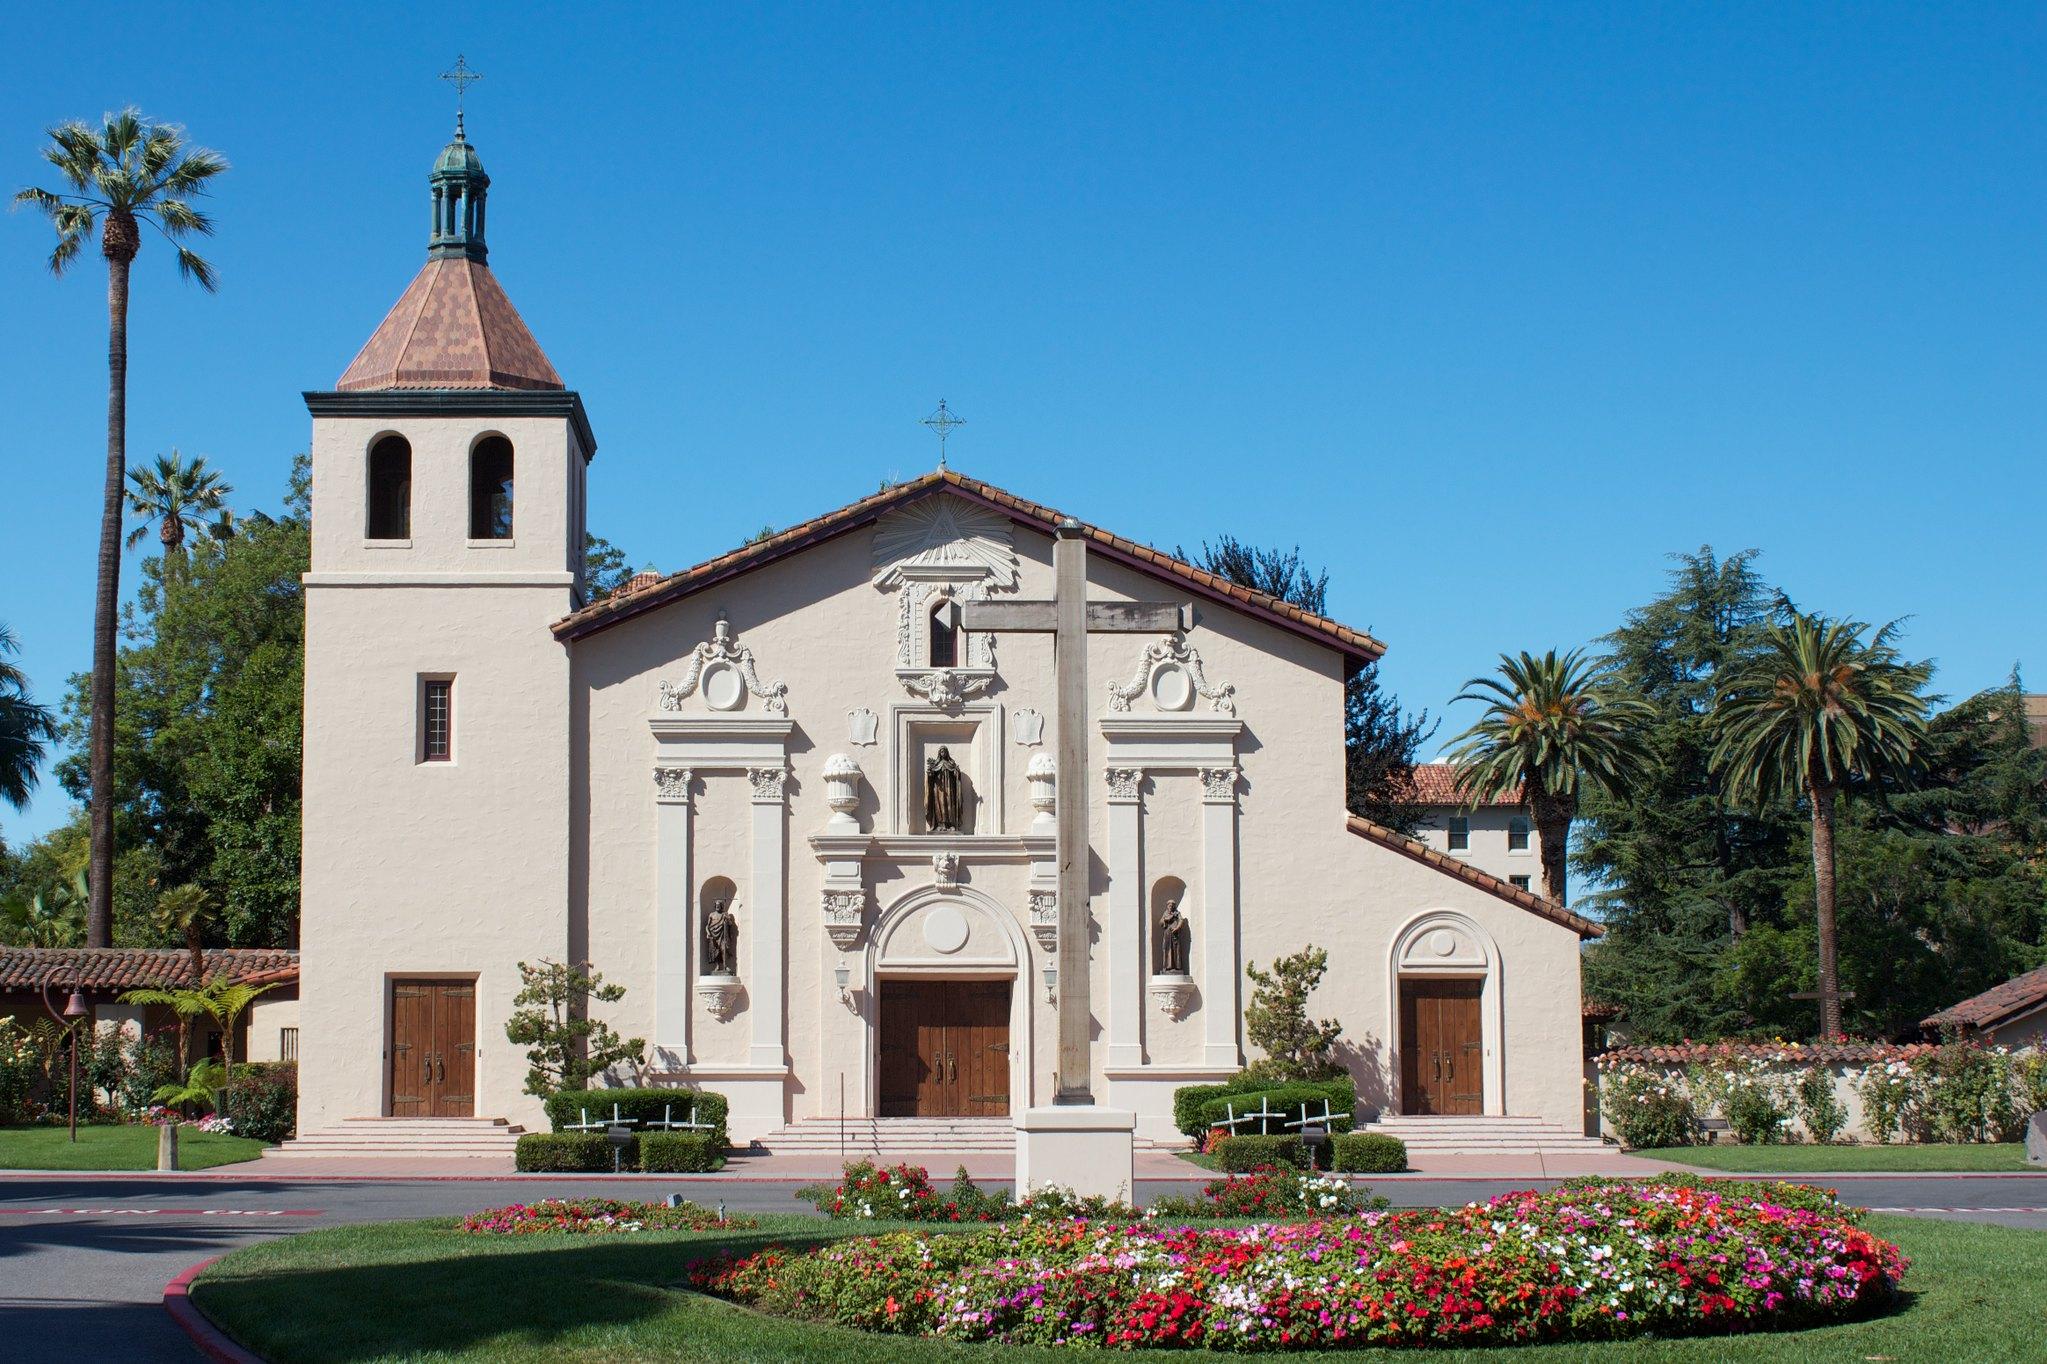 Mission church in Santa Clara California